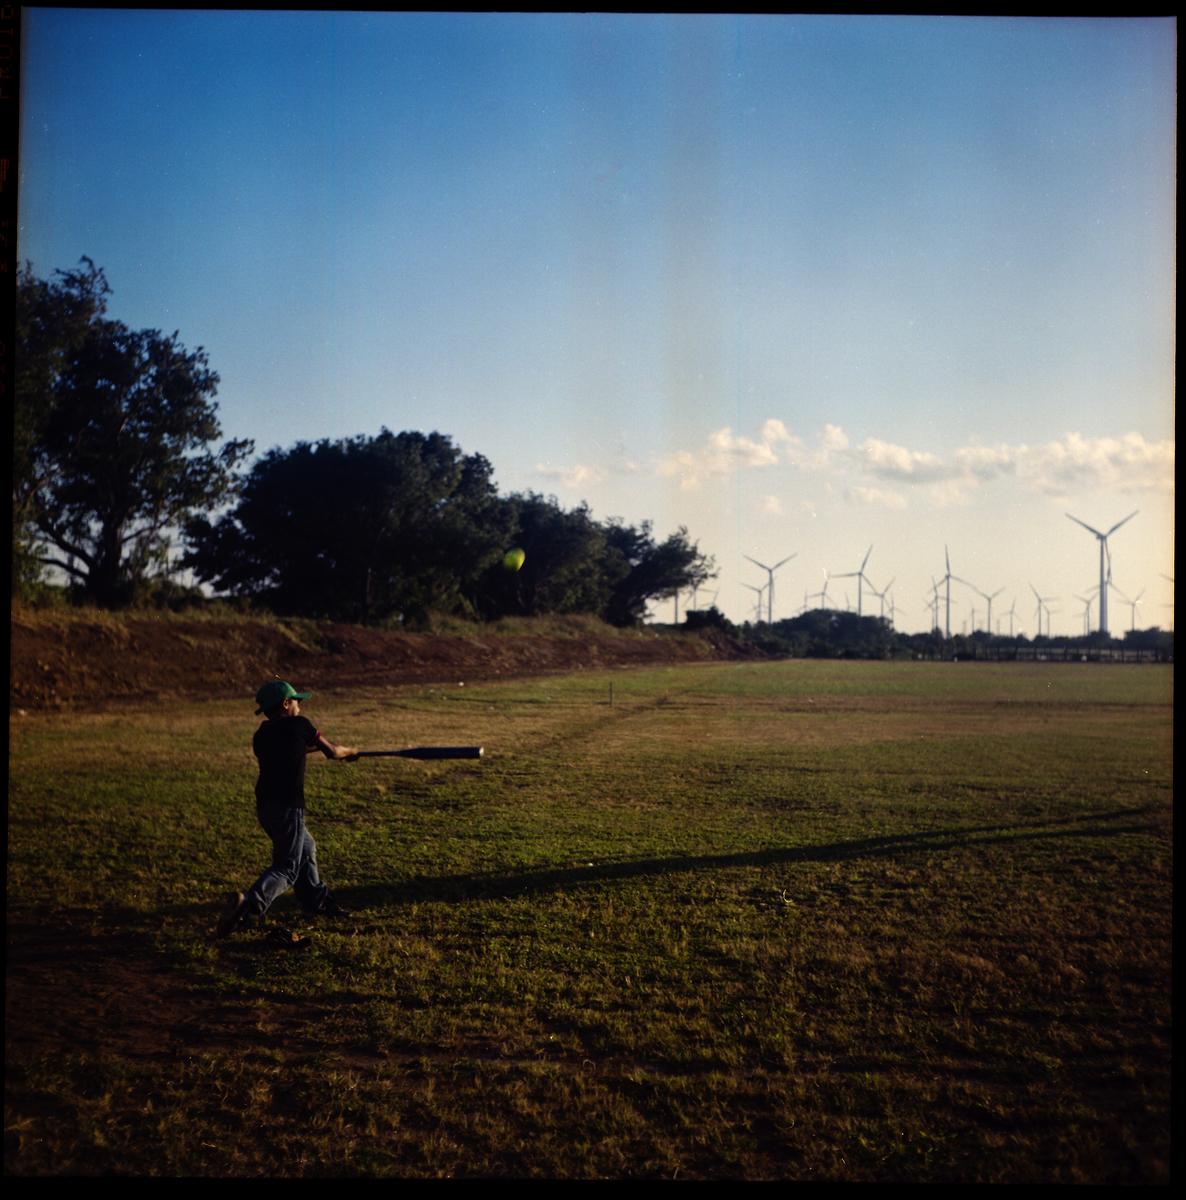 Oaxaca Windfarms Controversy